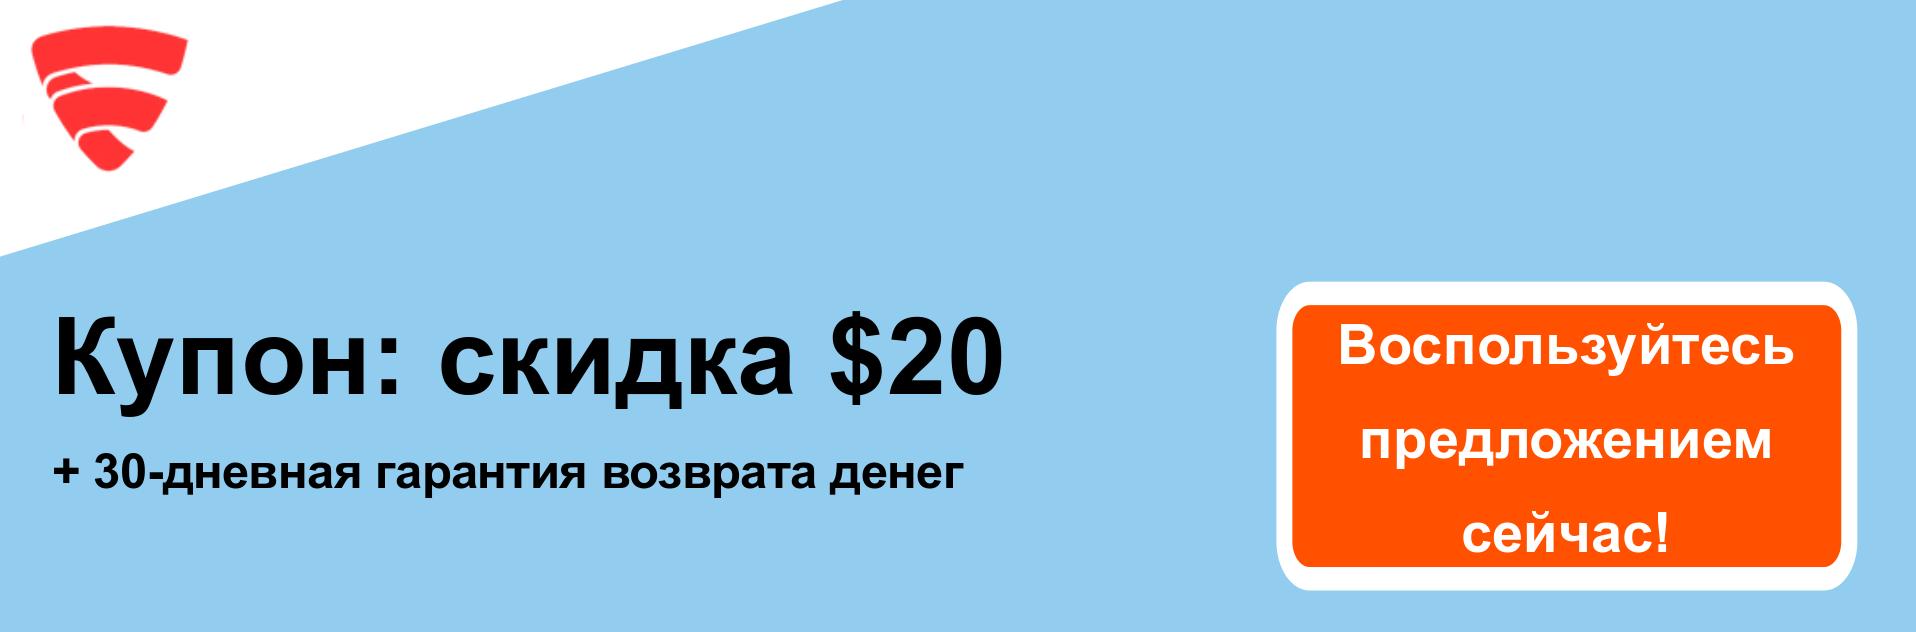 FSecureFreedome купона - $ 20